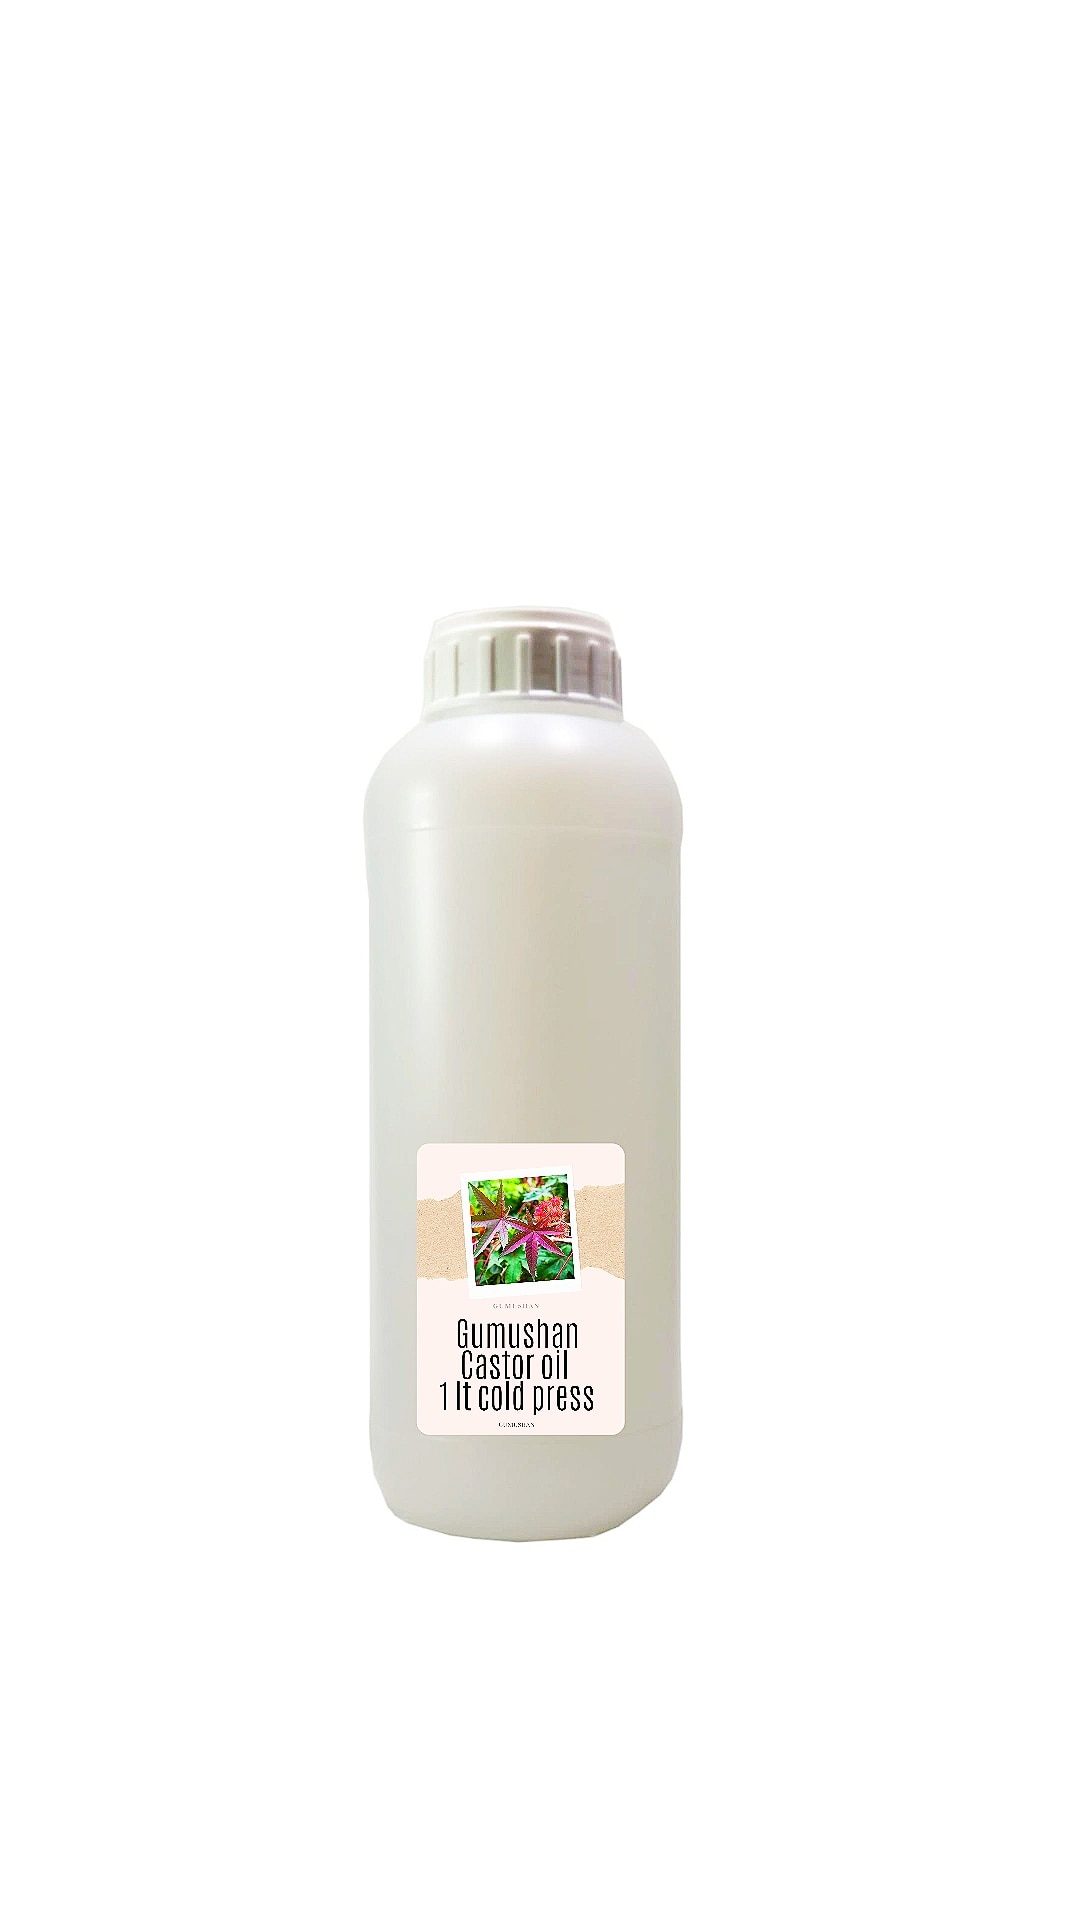 High quality pure Castor Oil 1 liter 34 fl oz 1000ml